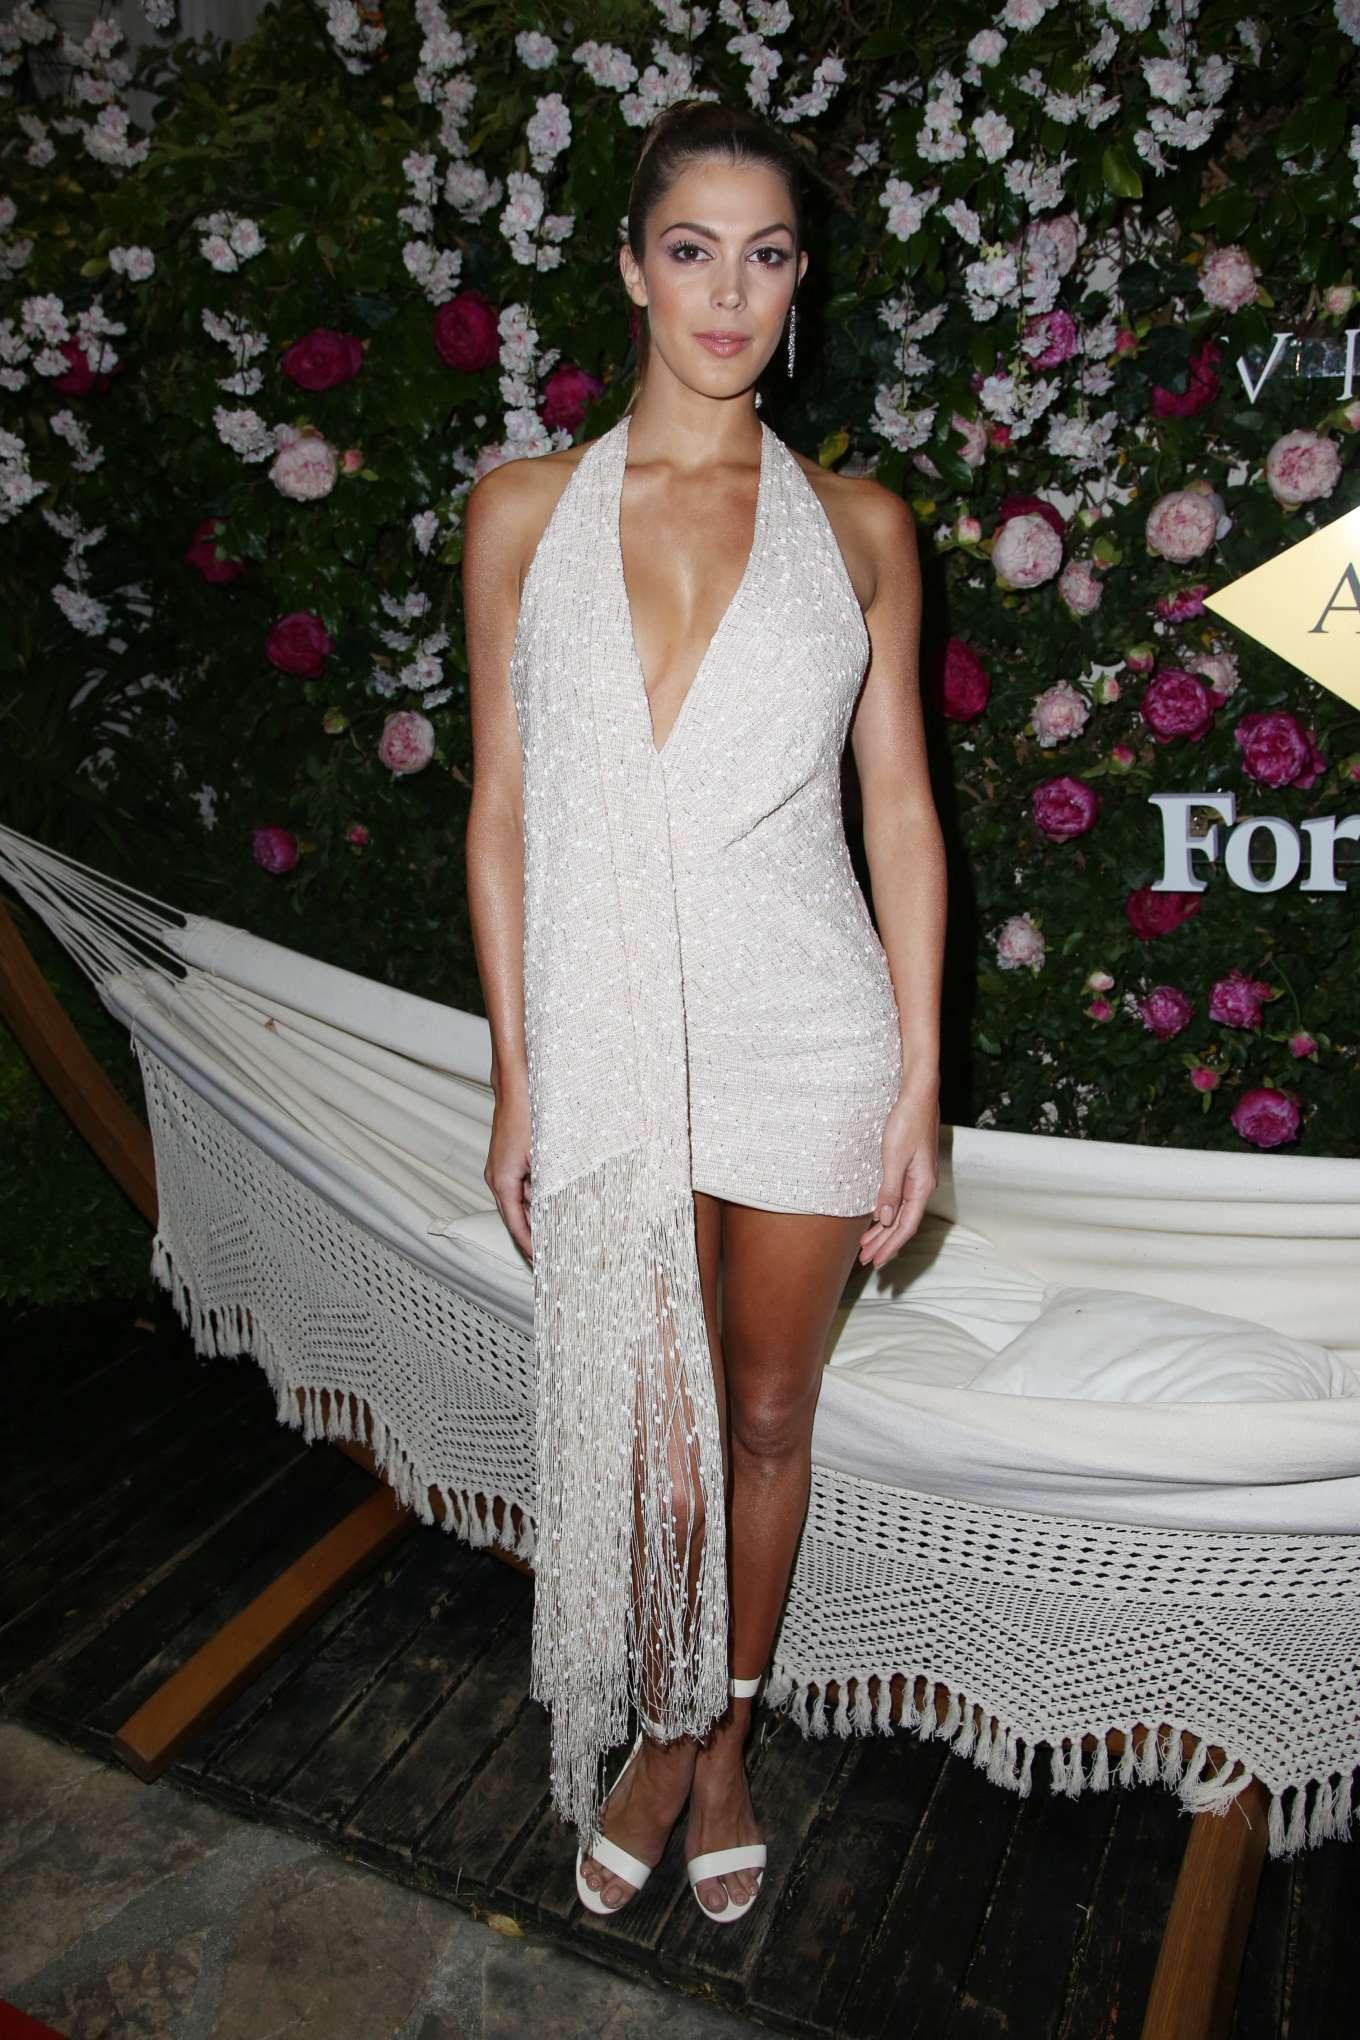 Iris Mittenaere 2019 : Iris Mittenaere at Villa AH in Cannes-07